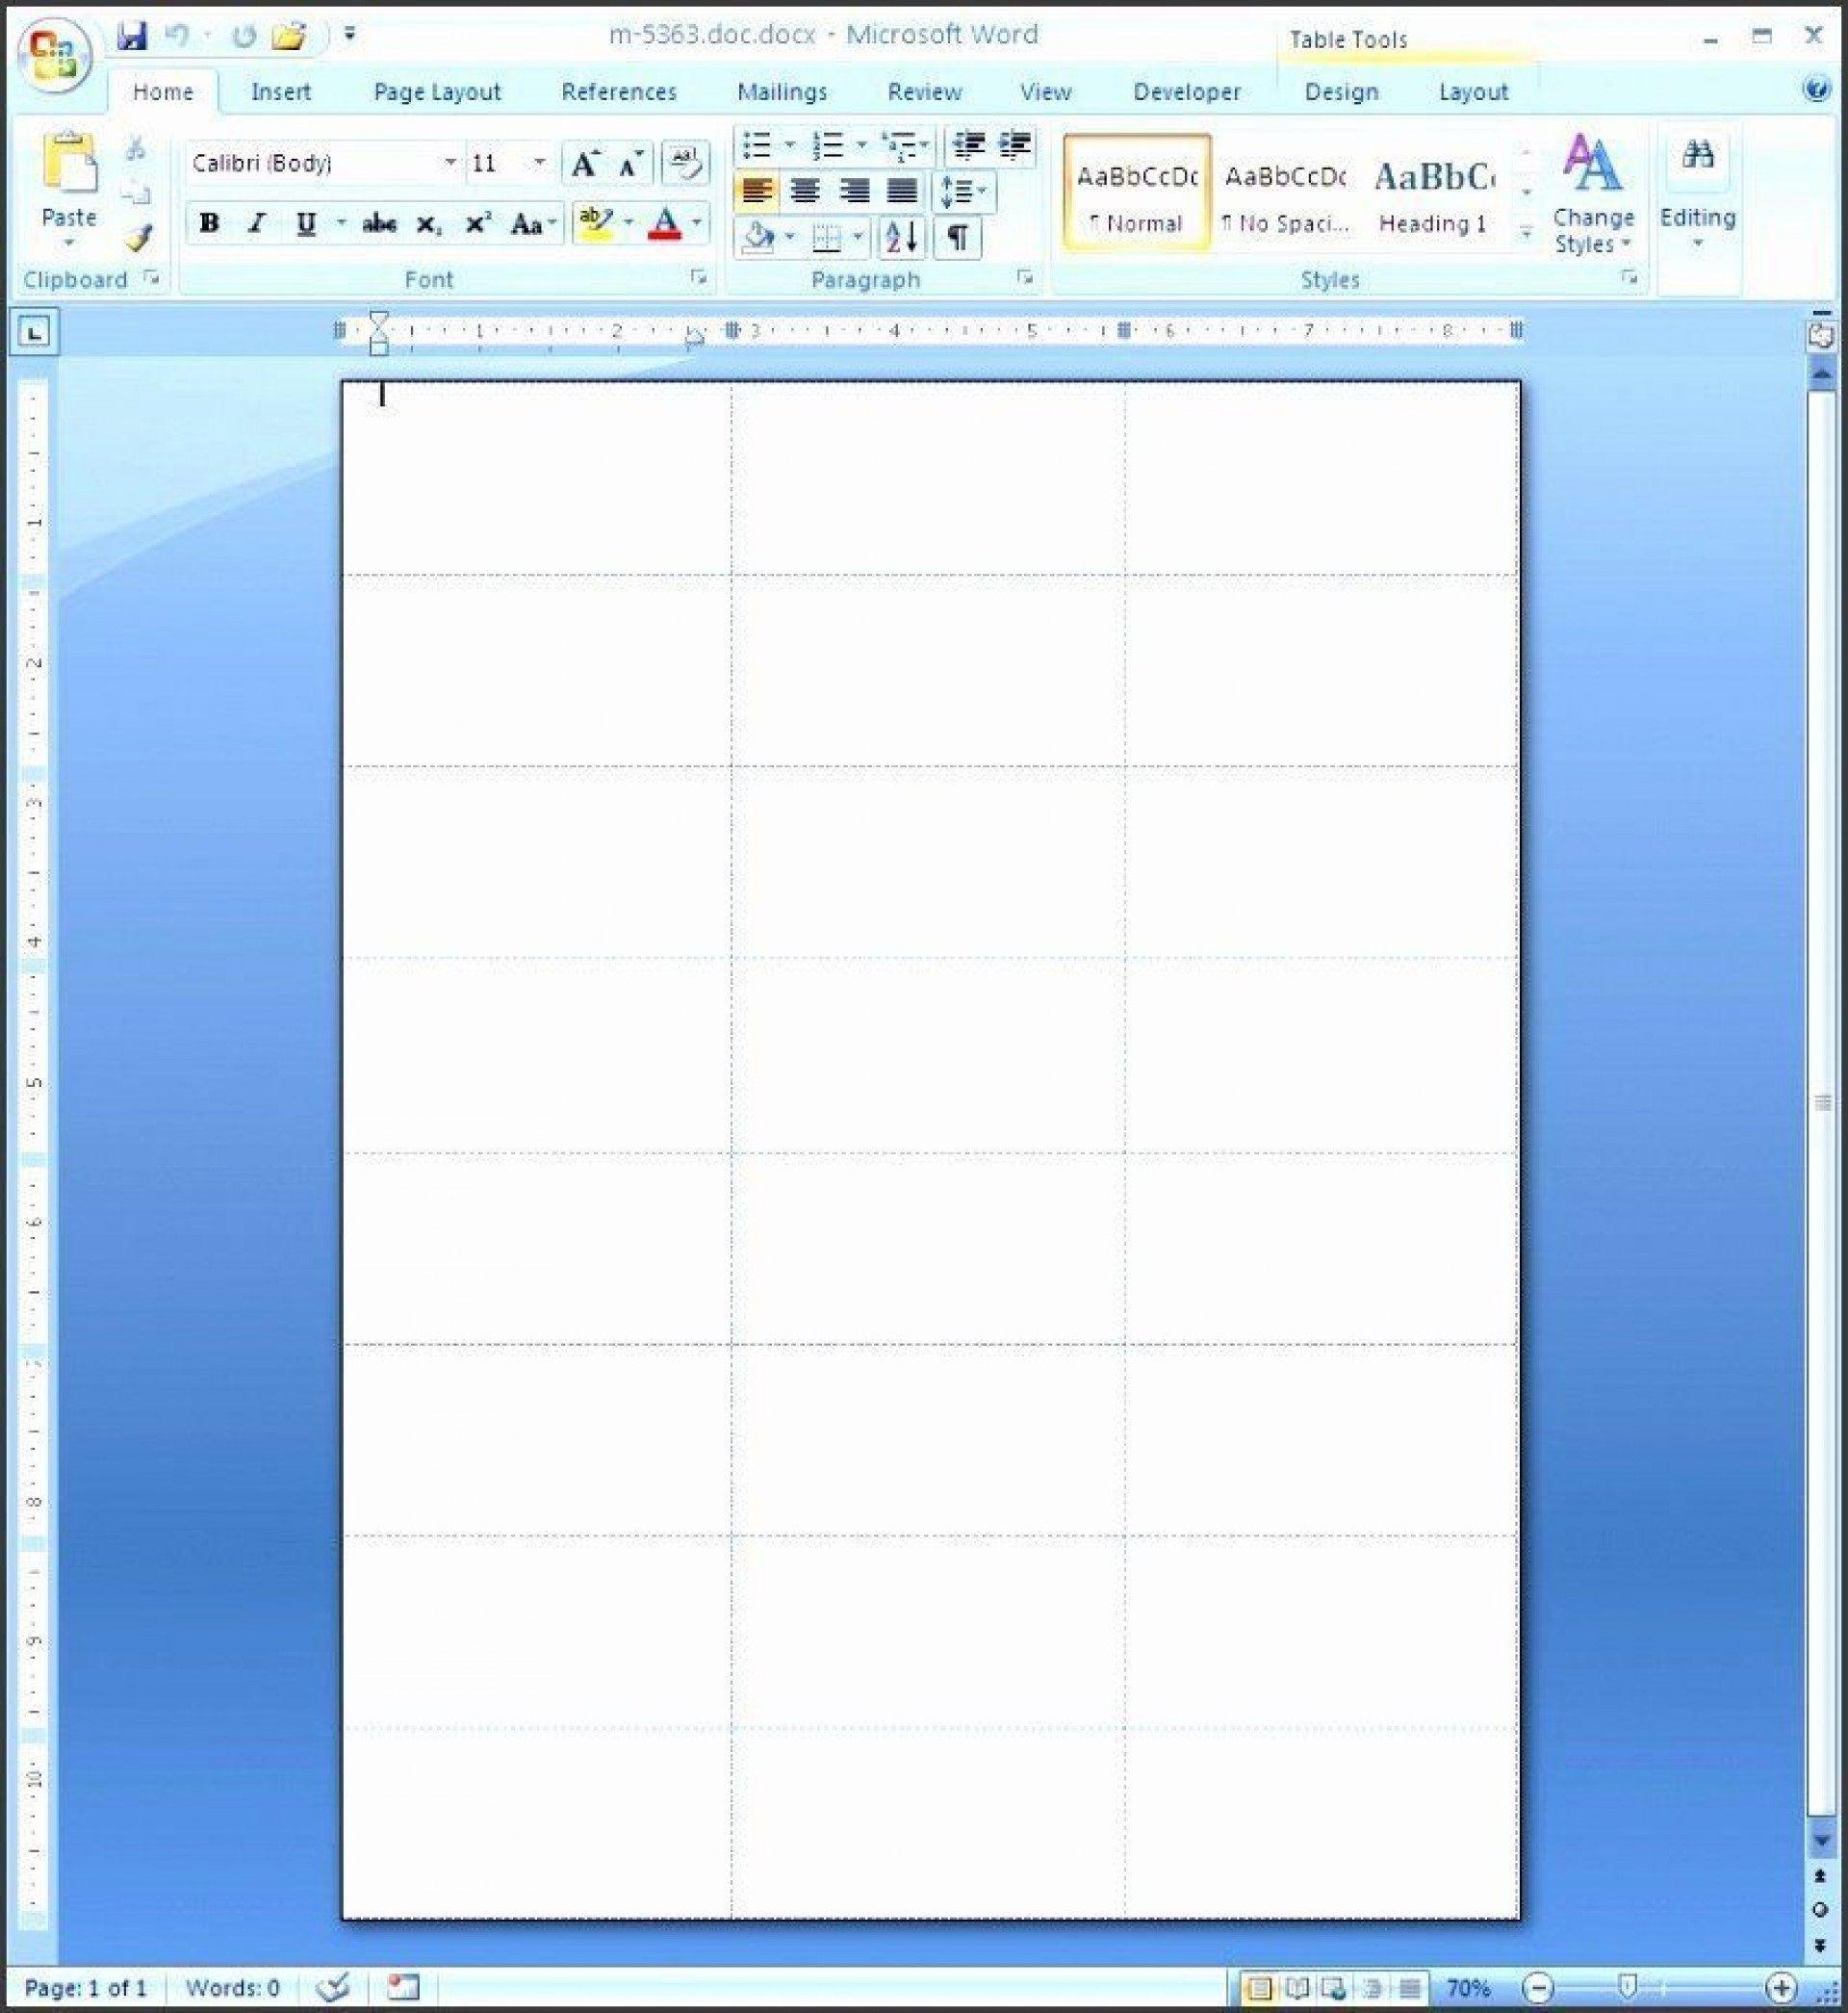 009 Stupendou Microsoft Word Addres Label Template 30 Per Sheet Photo 1920